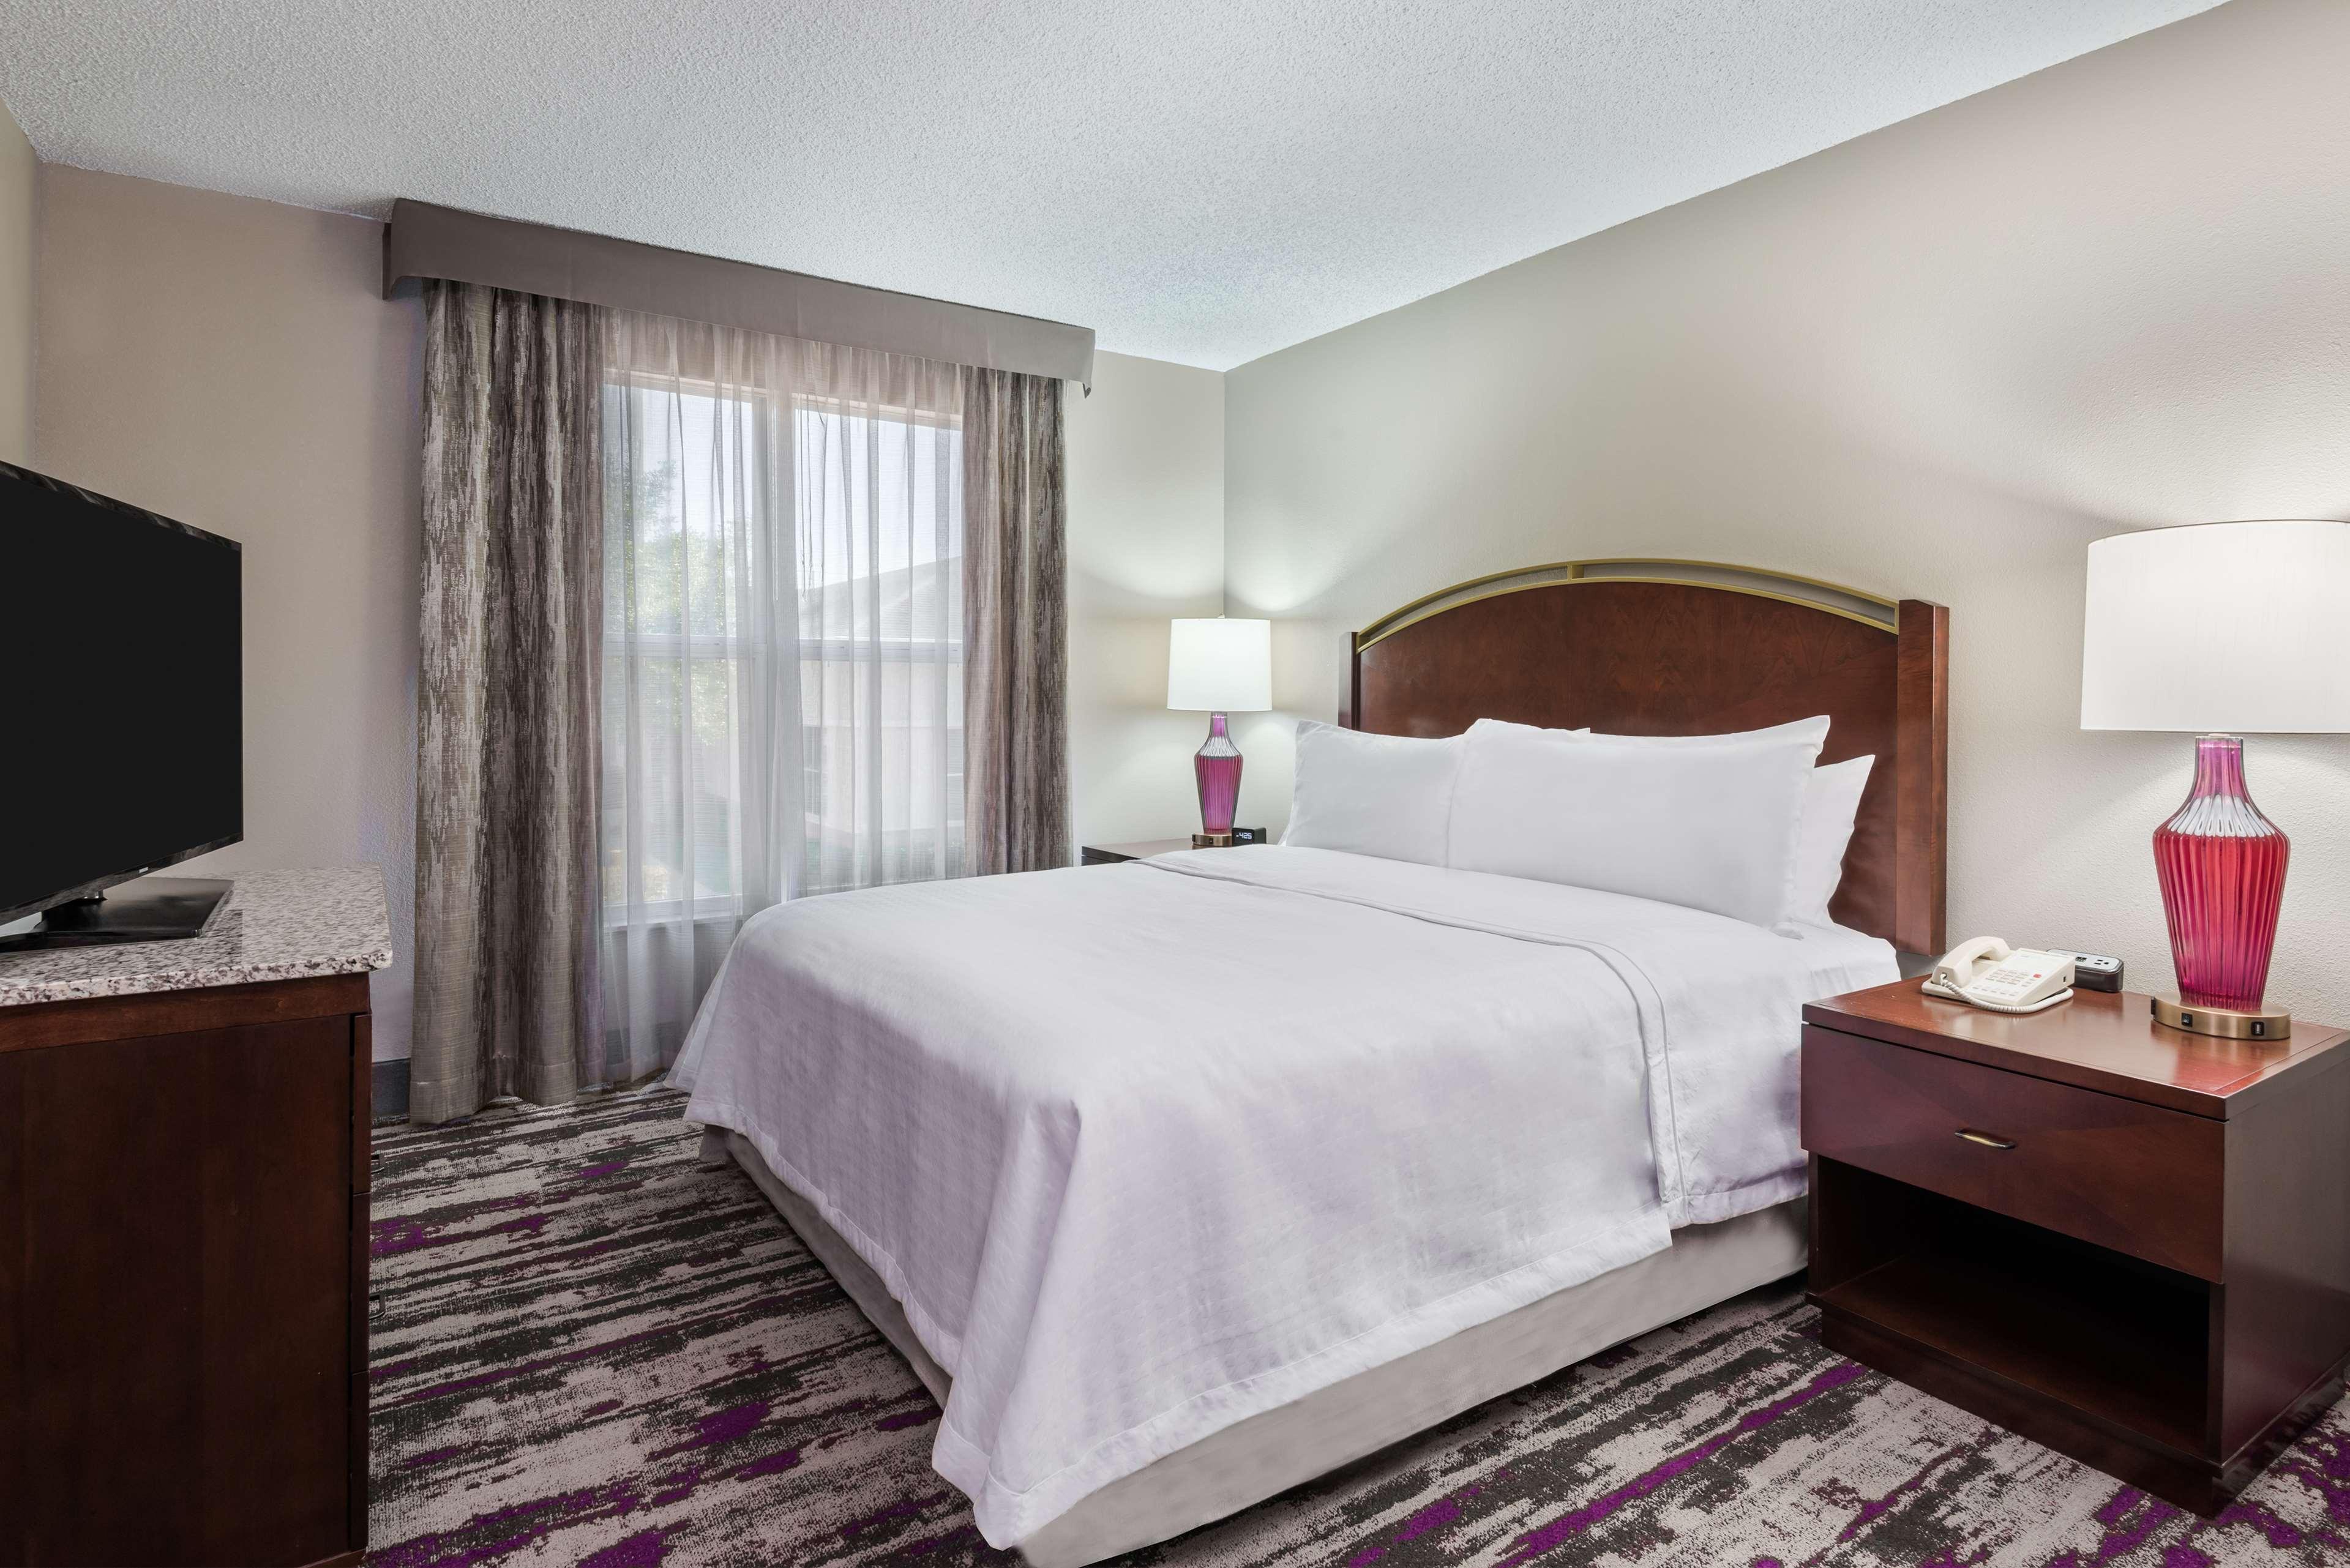 Homewood Suites by Hilton Orlando-UCF Area image 21